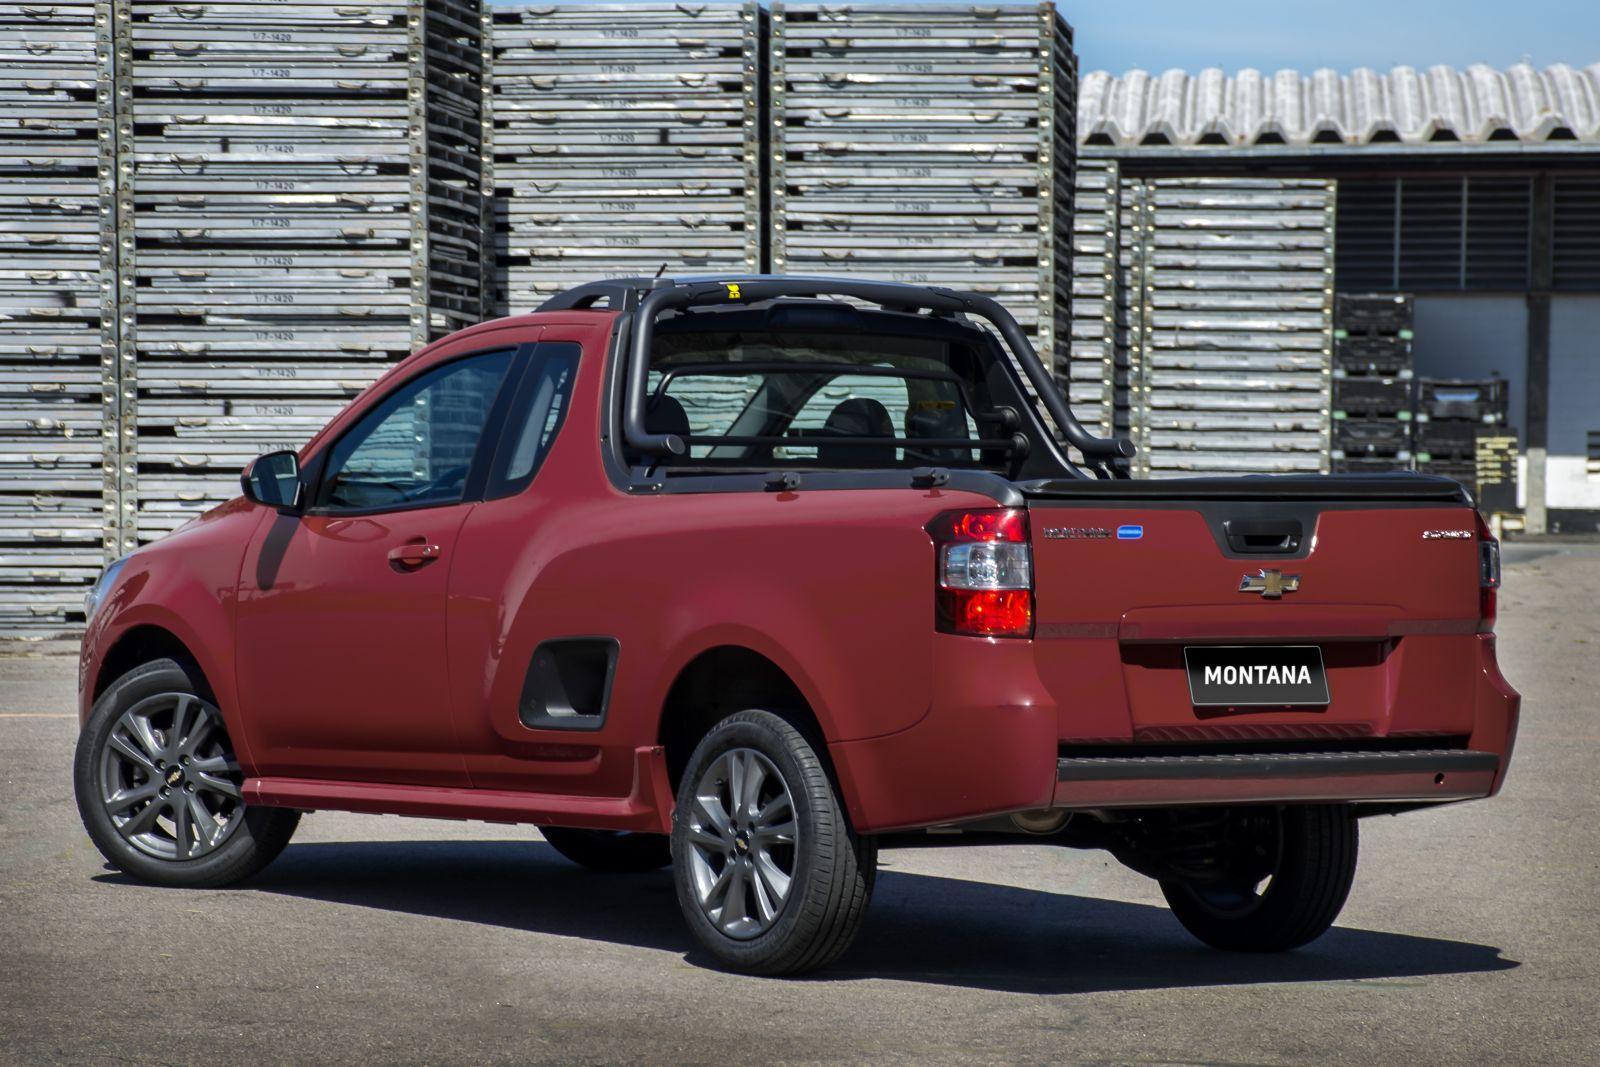 Chevrolet Montana 2018